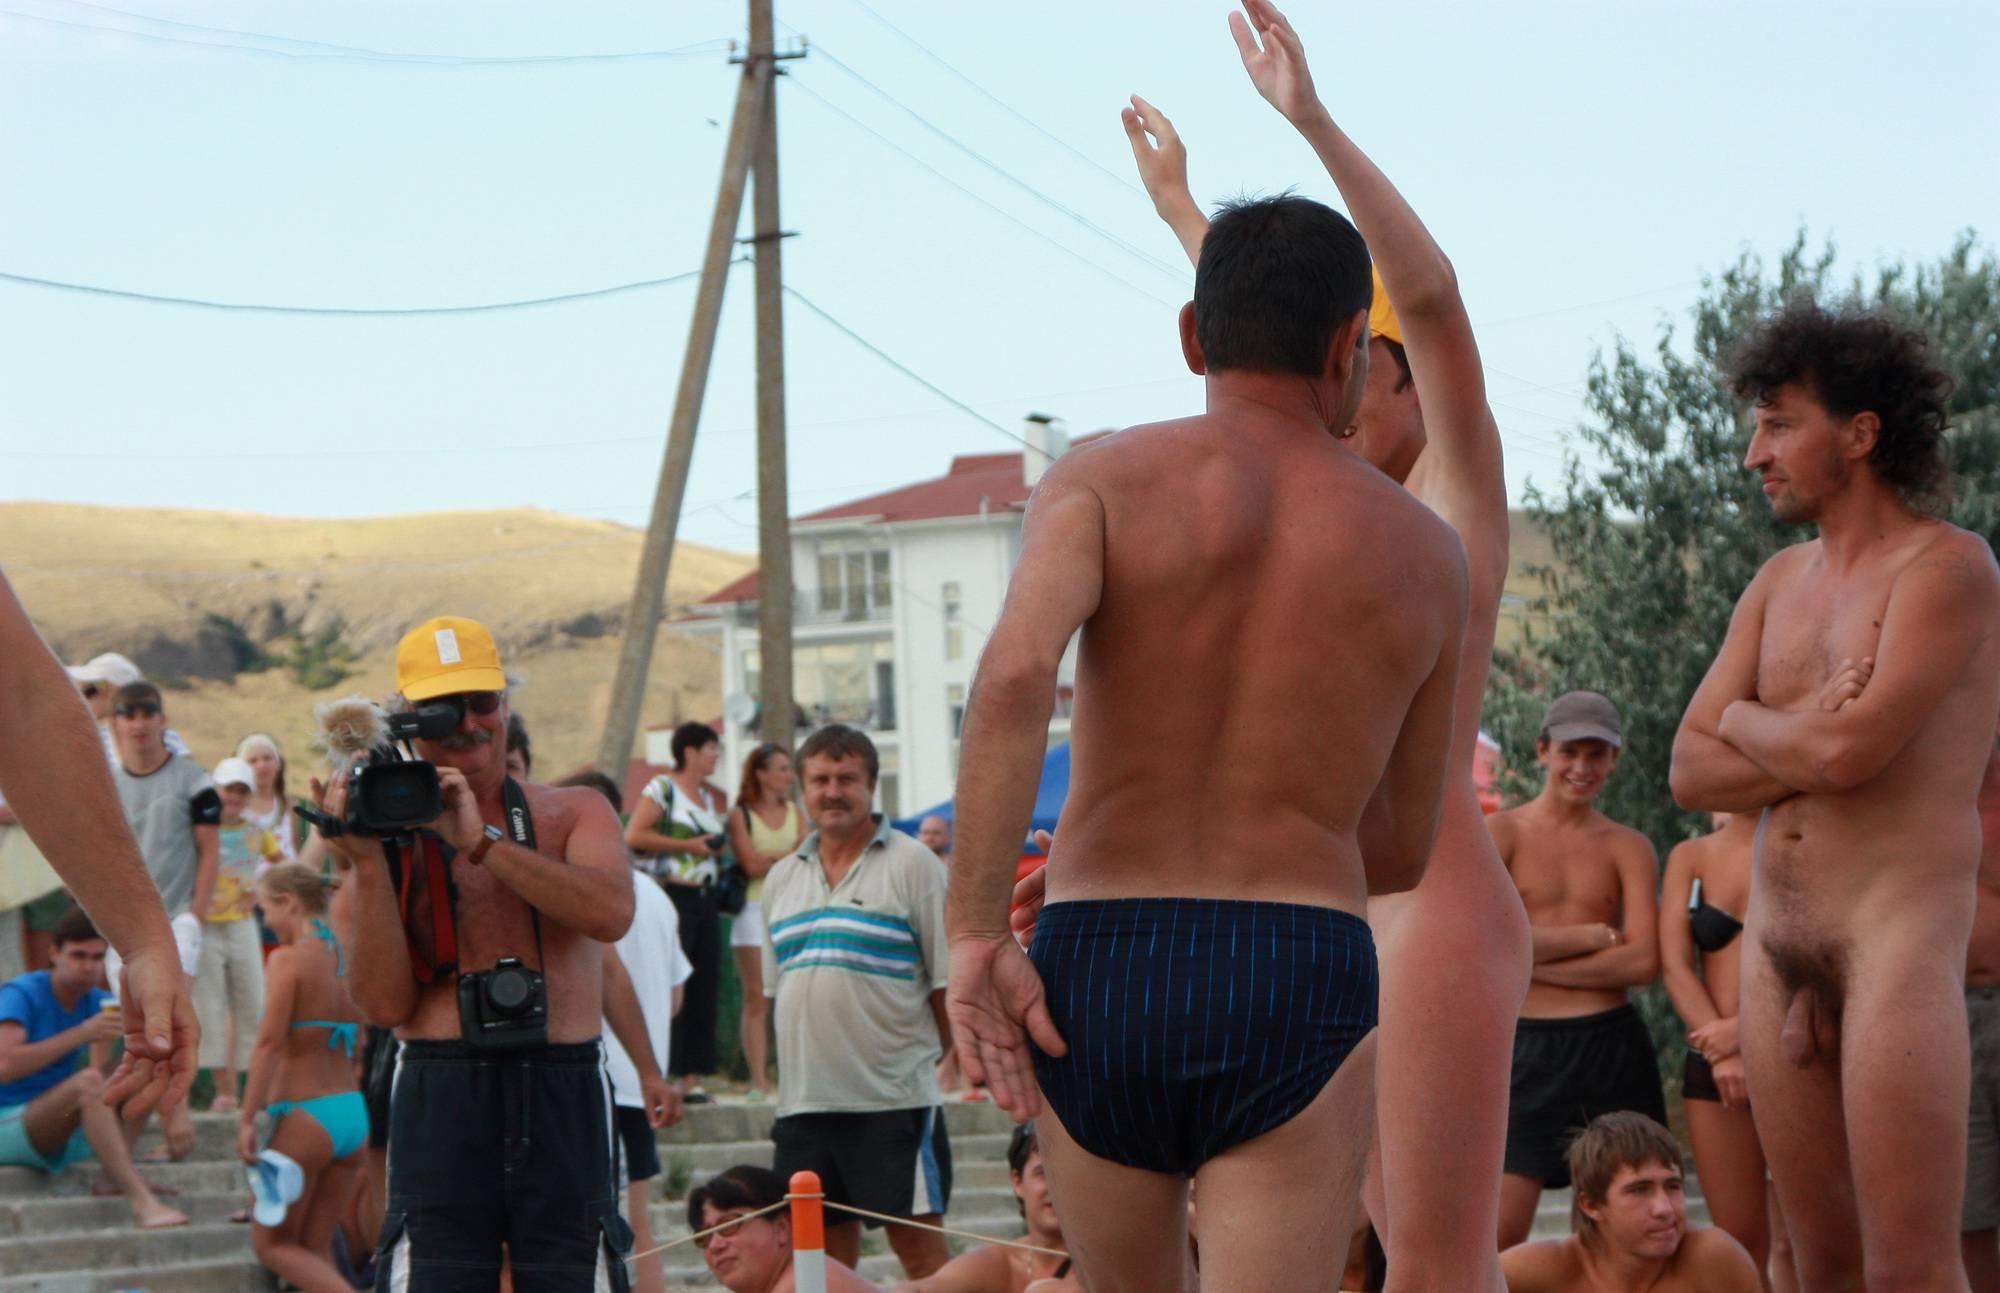 Purenudism Photos Ukrainian Men Dance Day - 2